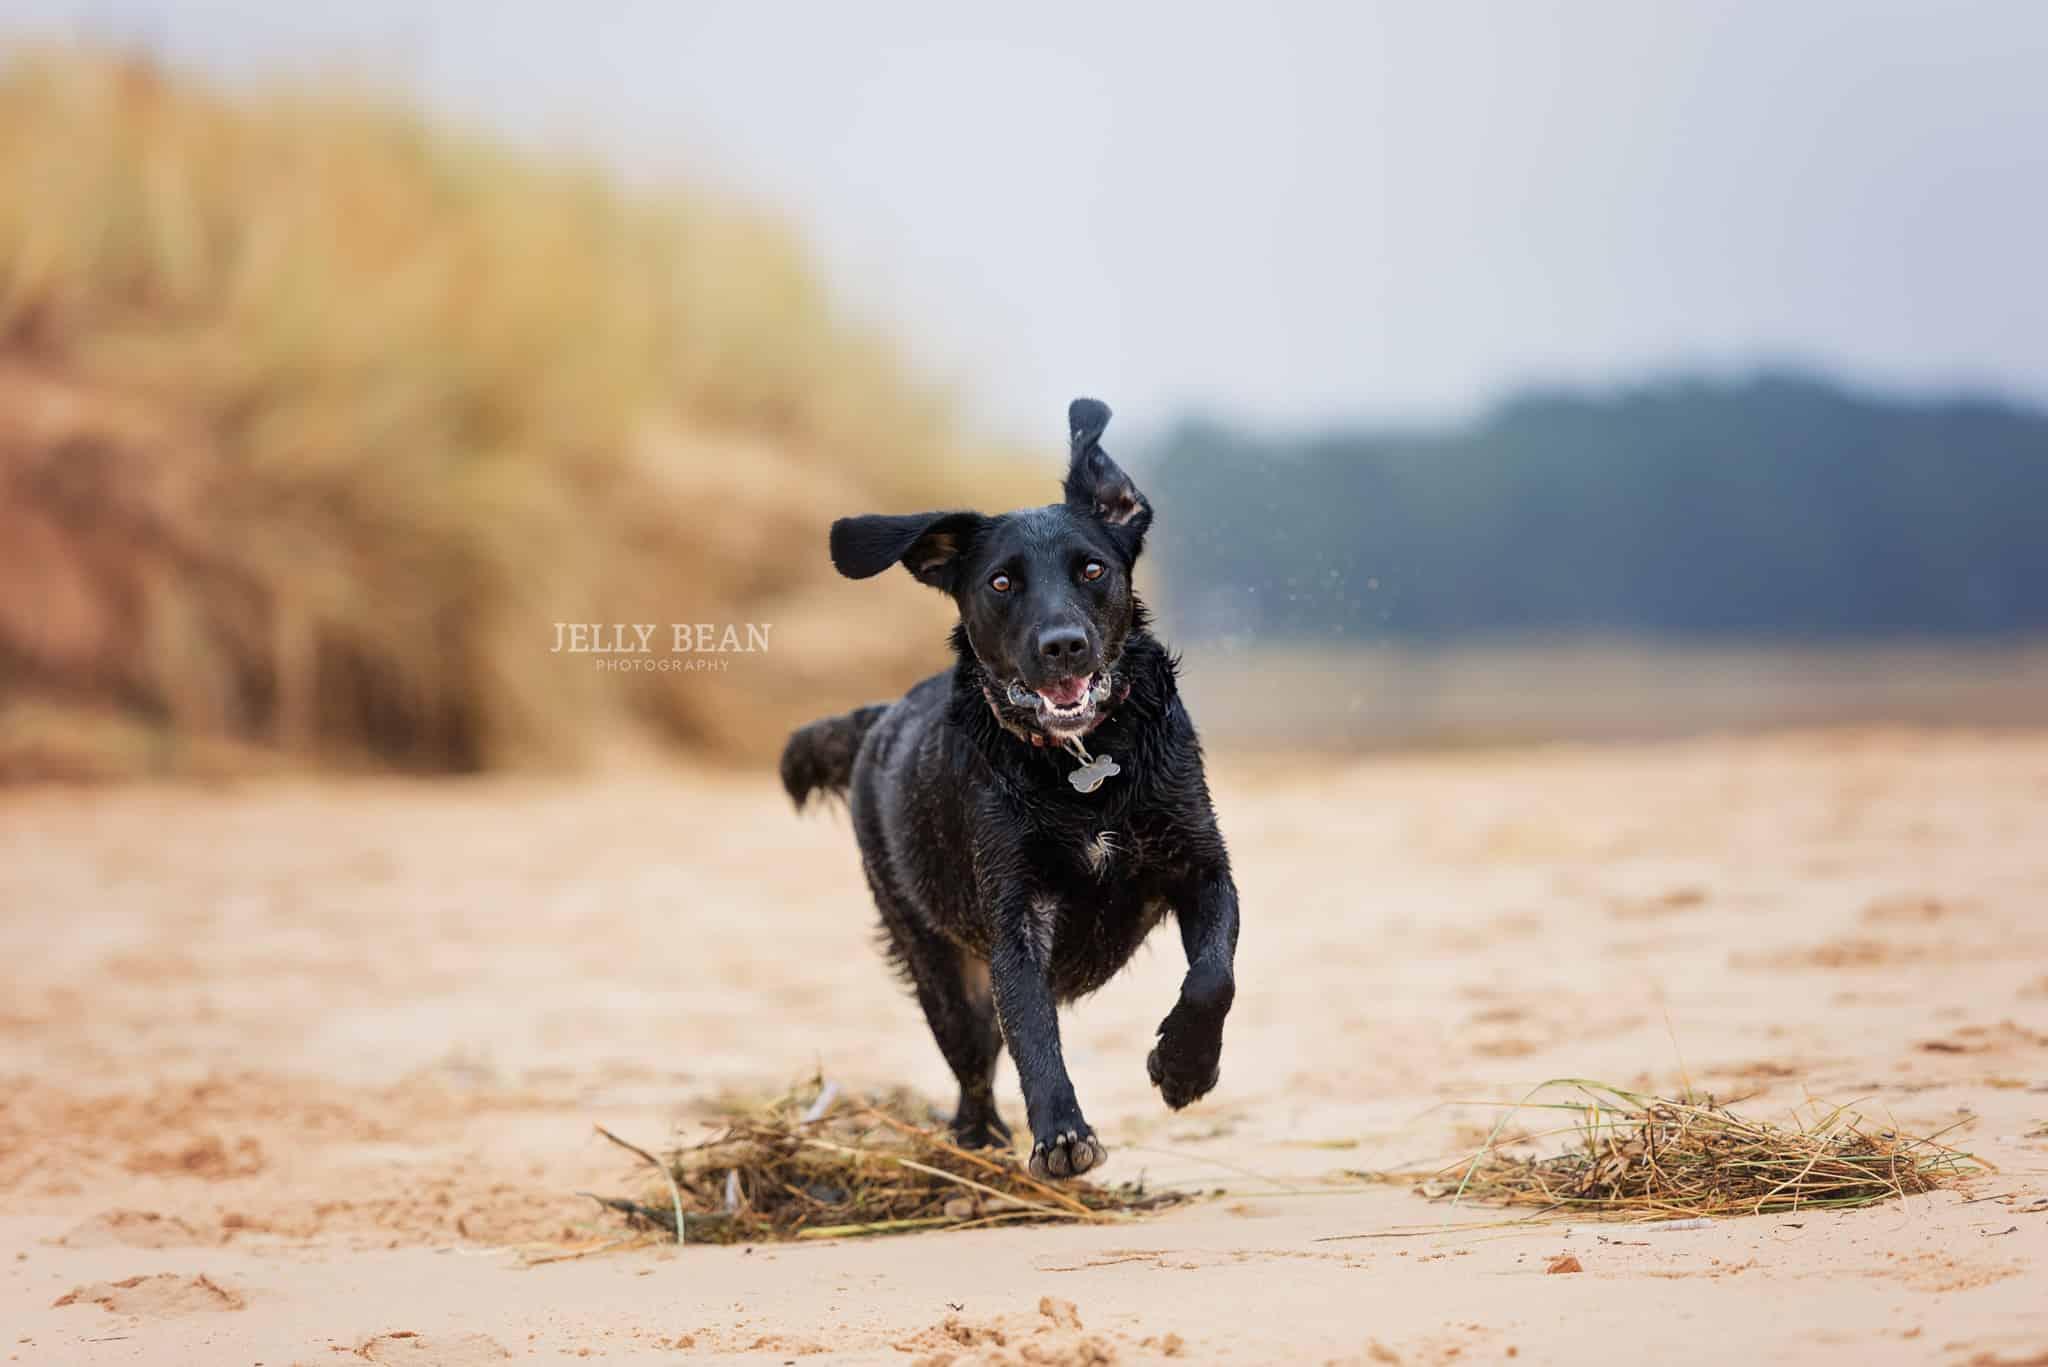 Dog running towards camera on beach